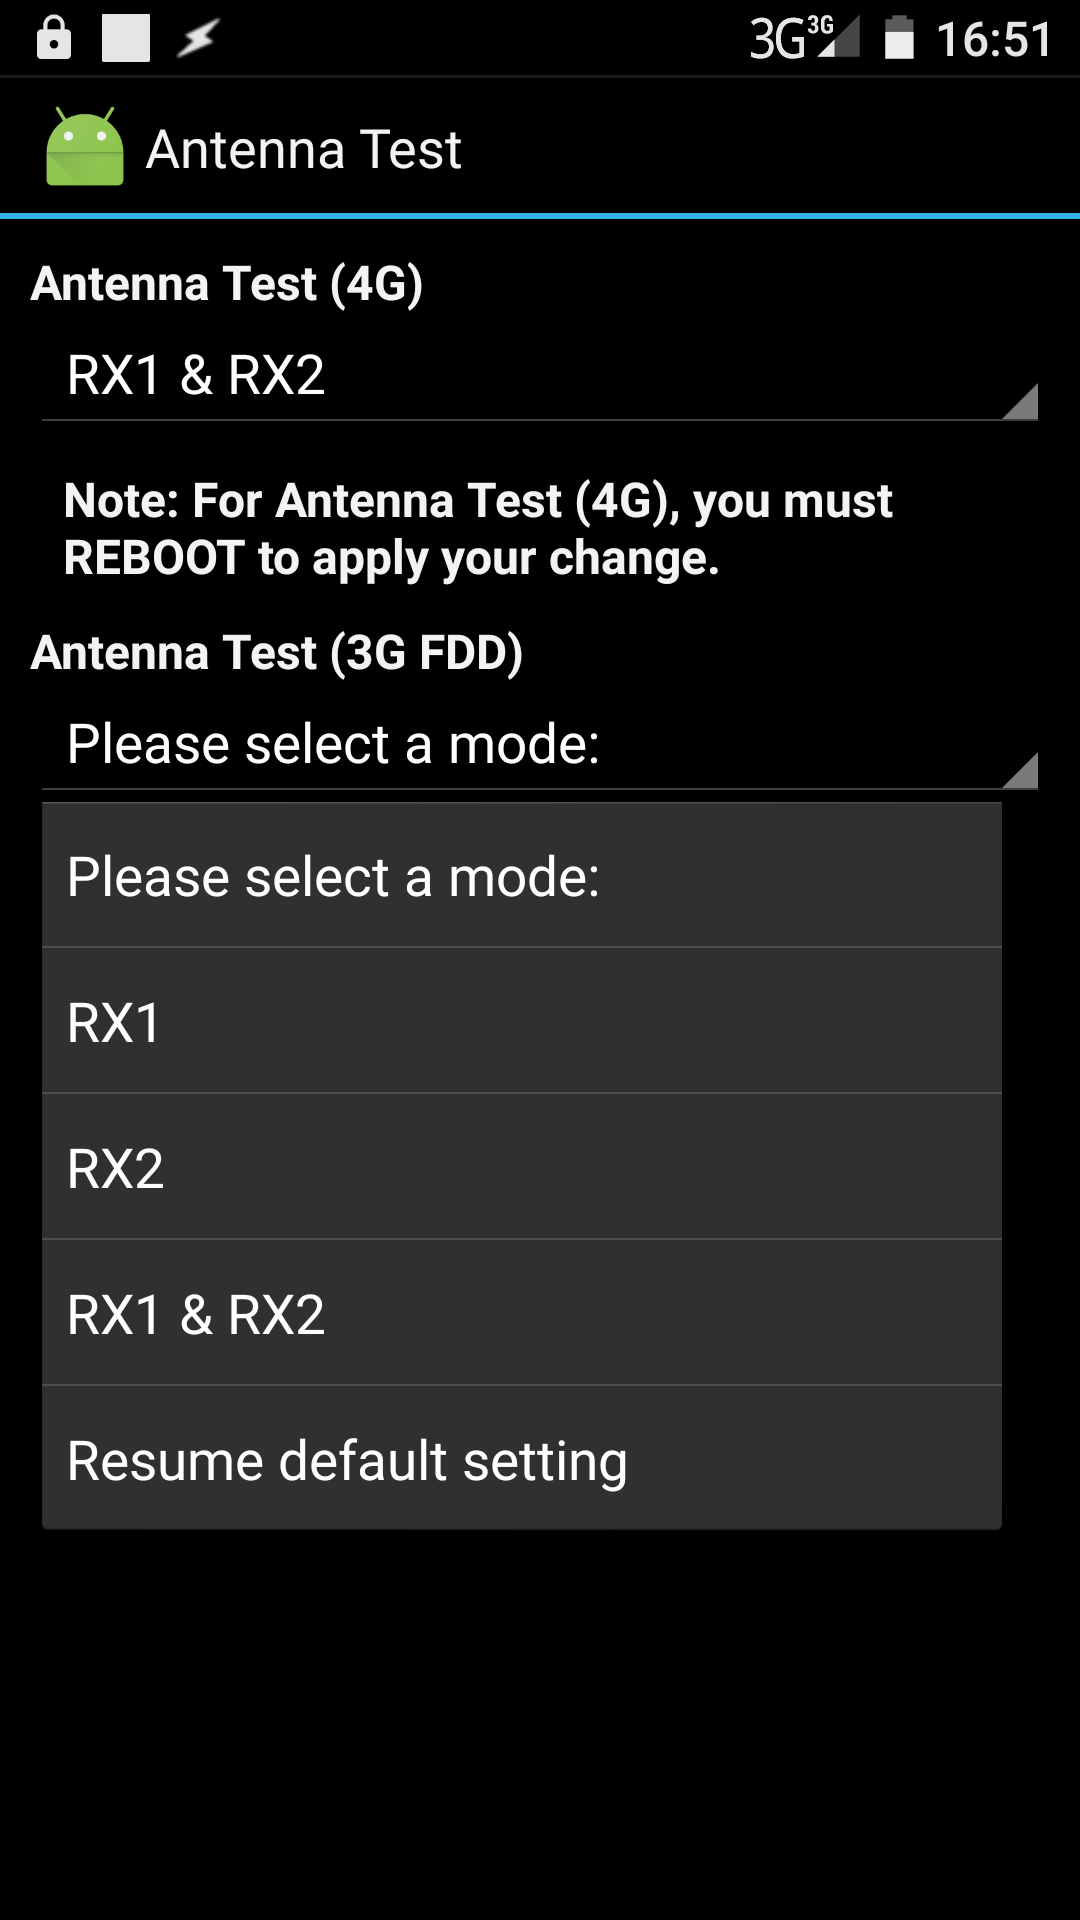 Samsung Galaxy S6 S6 Edge(+) - obecná diskuze - MobilMania.cz 4bd19beb4a3